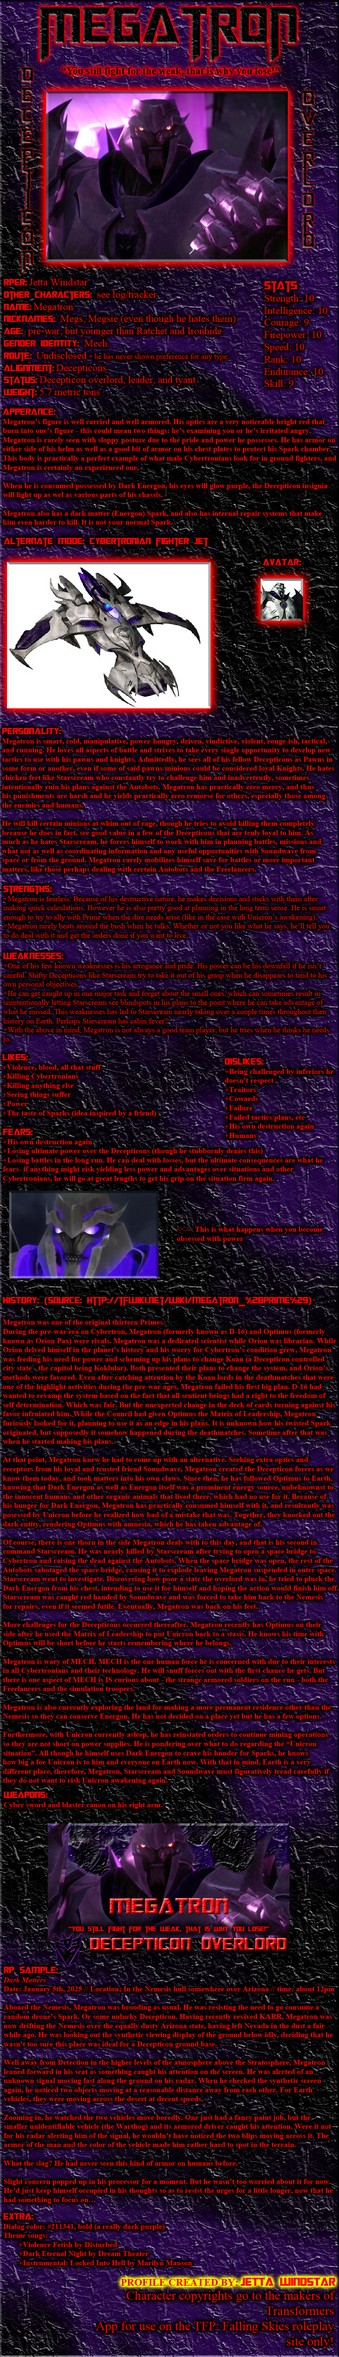 Megatron: TFP Falling Skies Profile by Jetta-Windstar